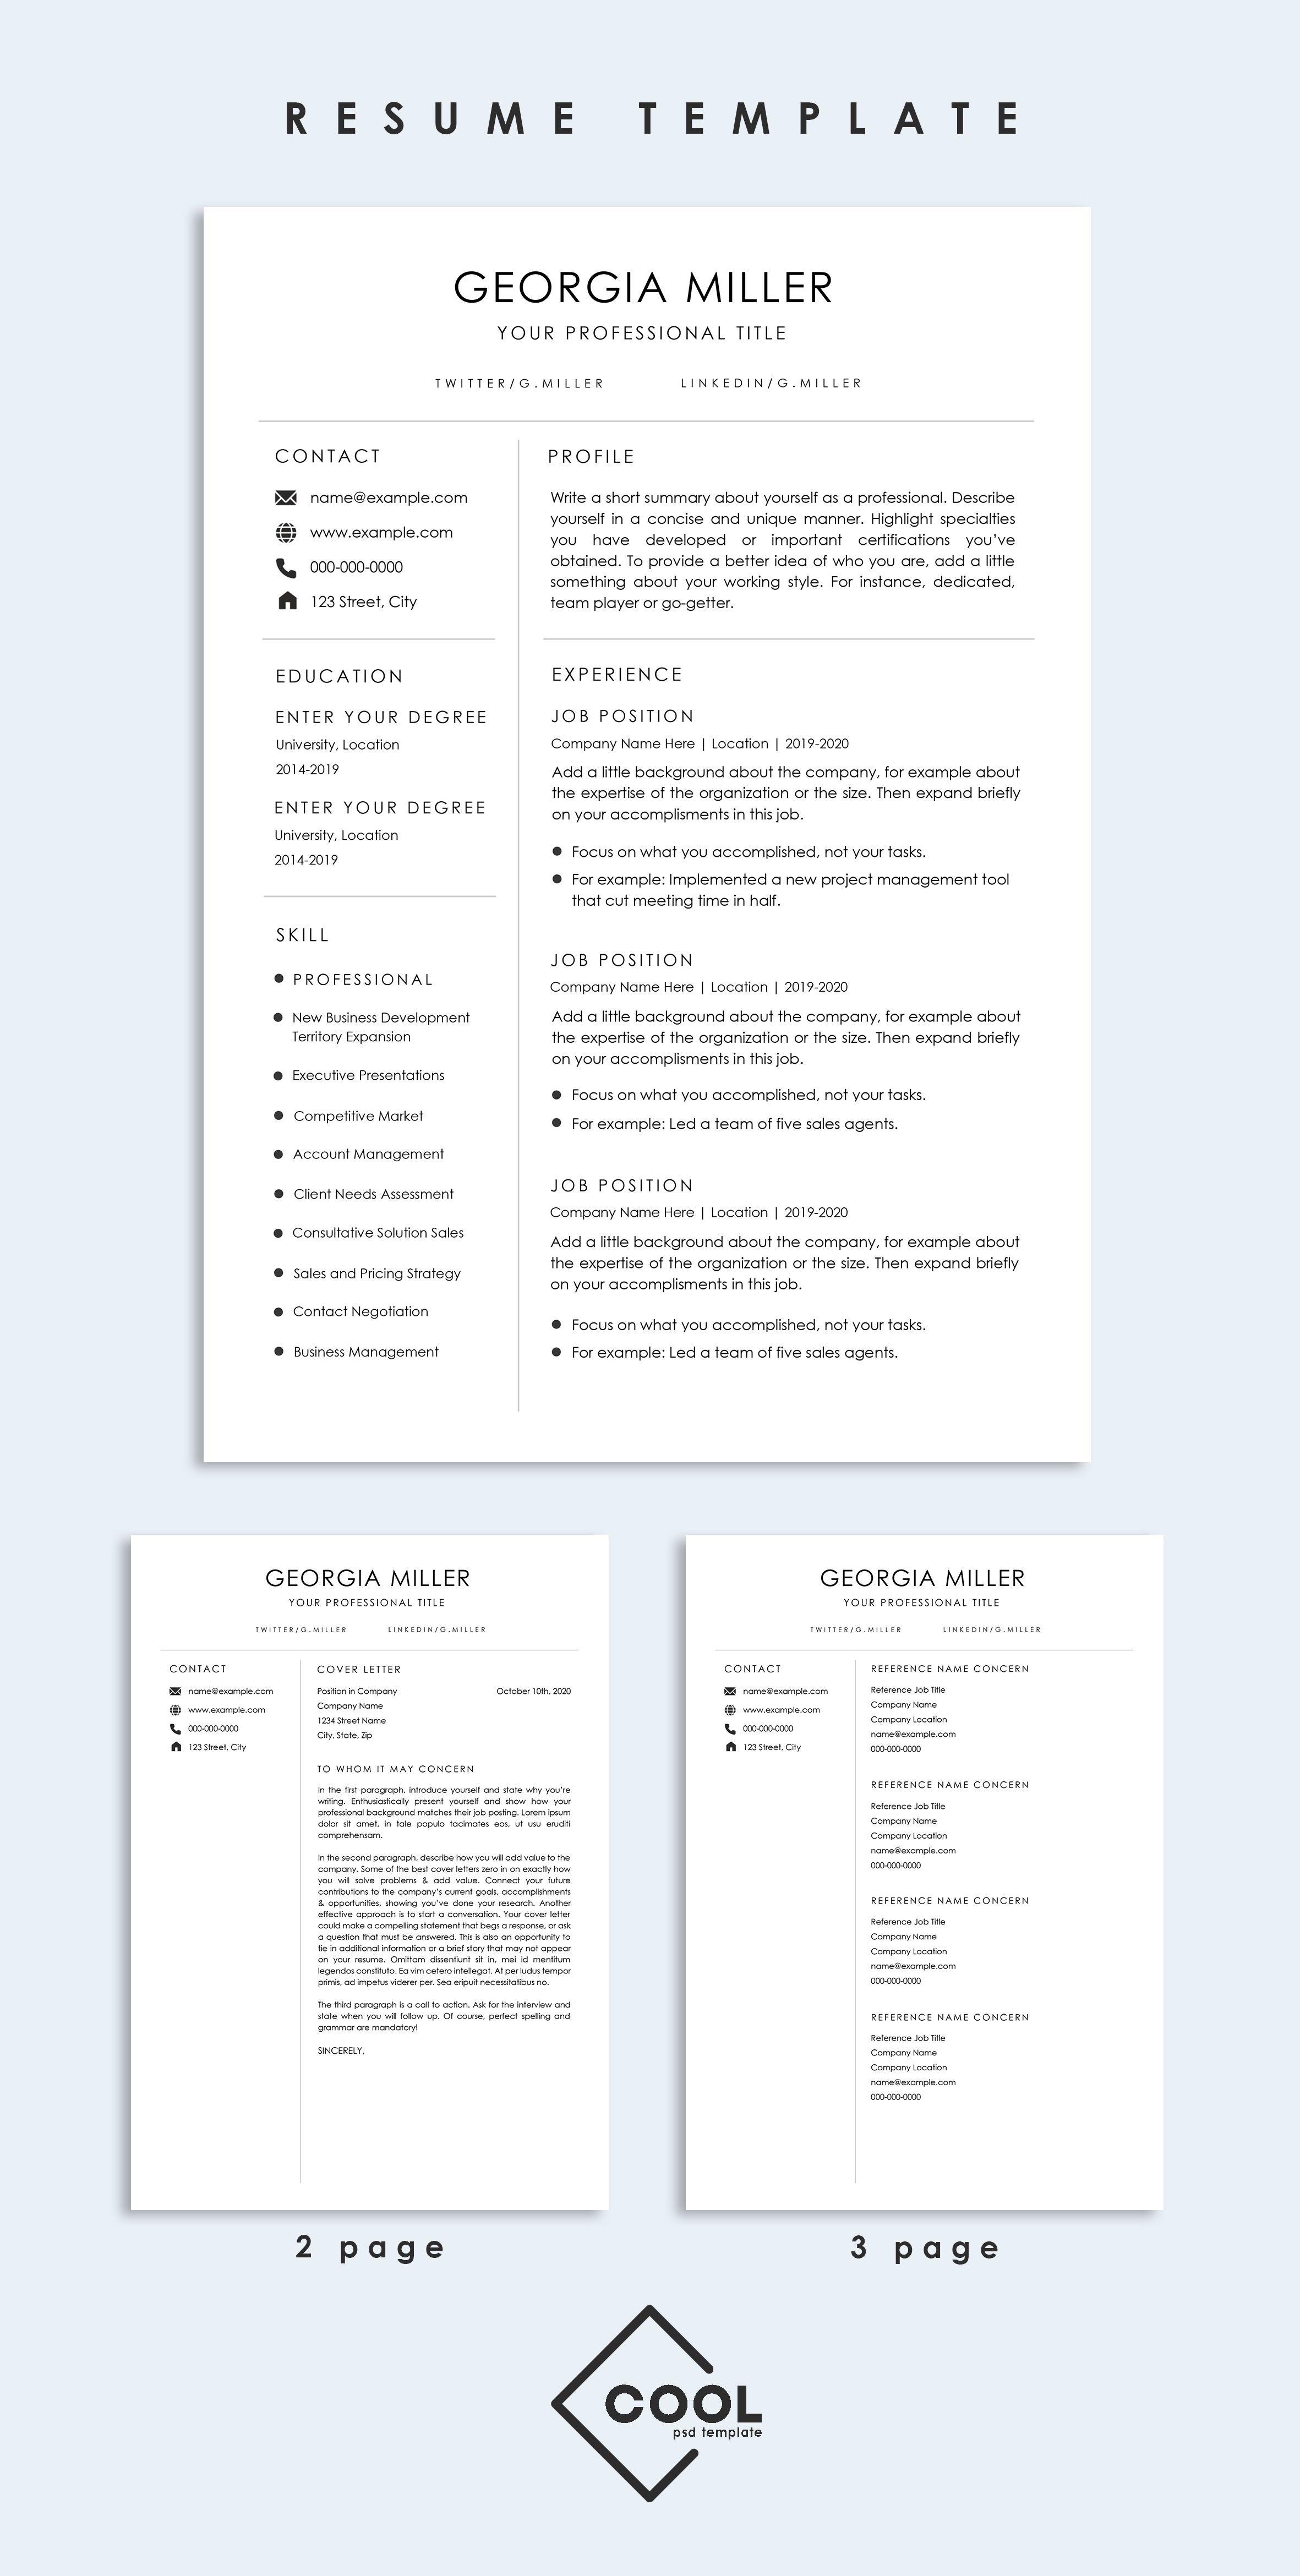 Resume template, Professional resume template, Resume